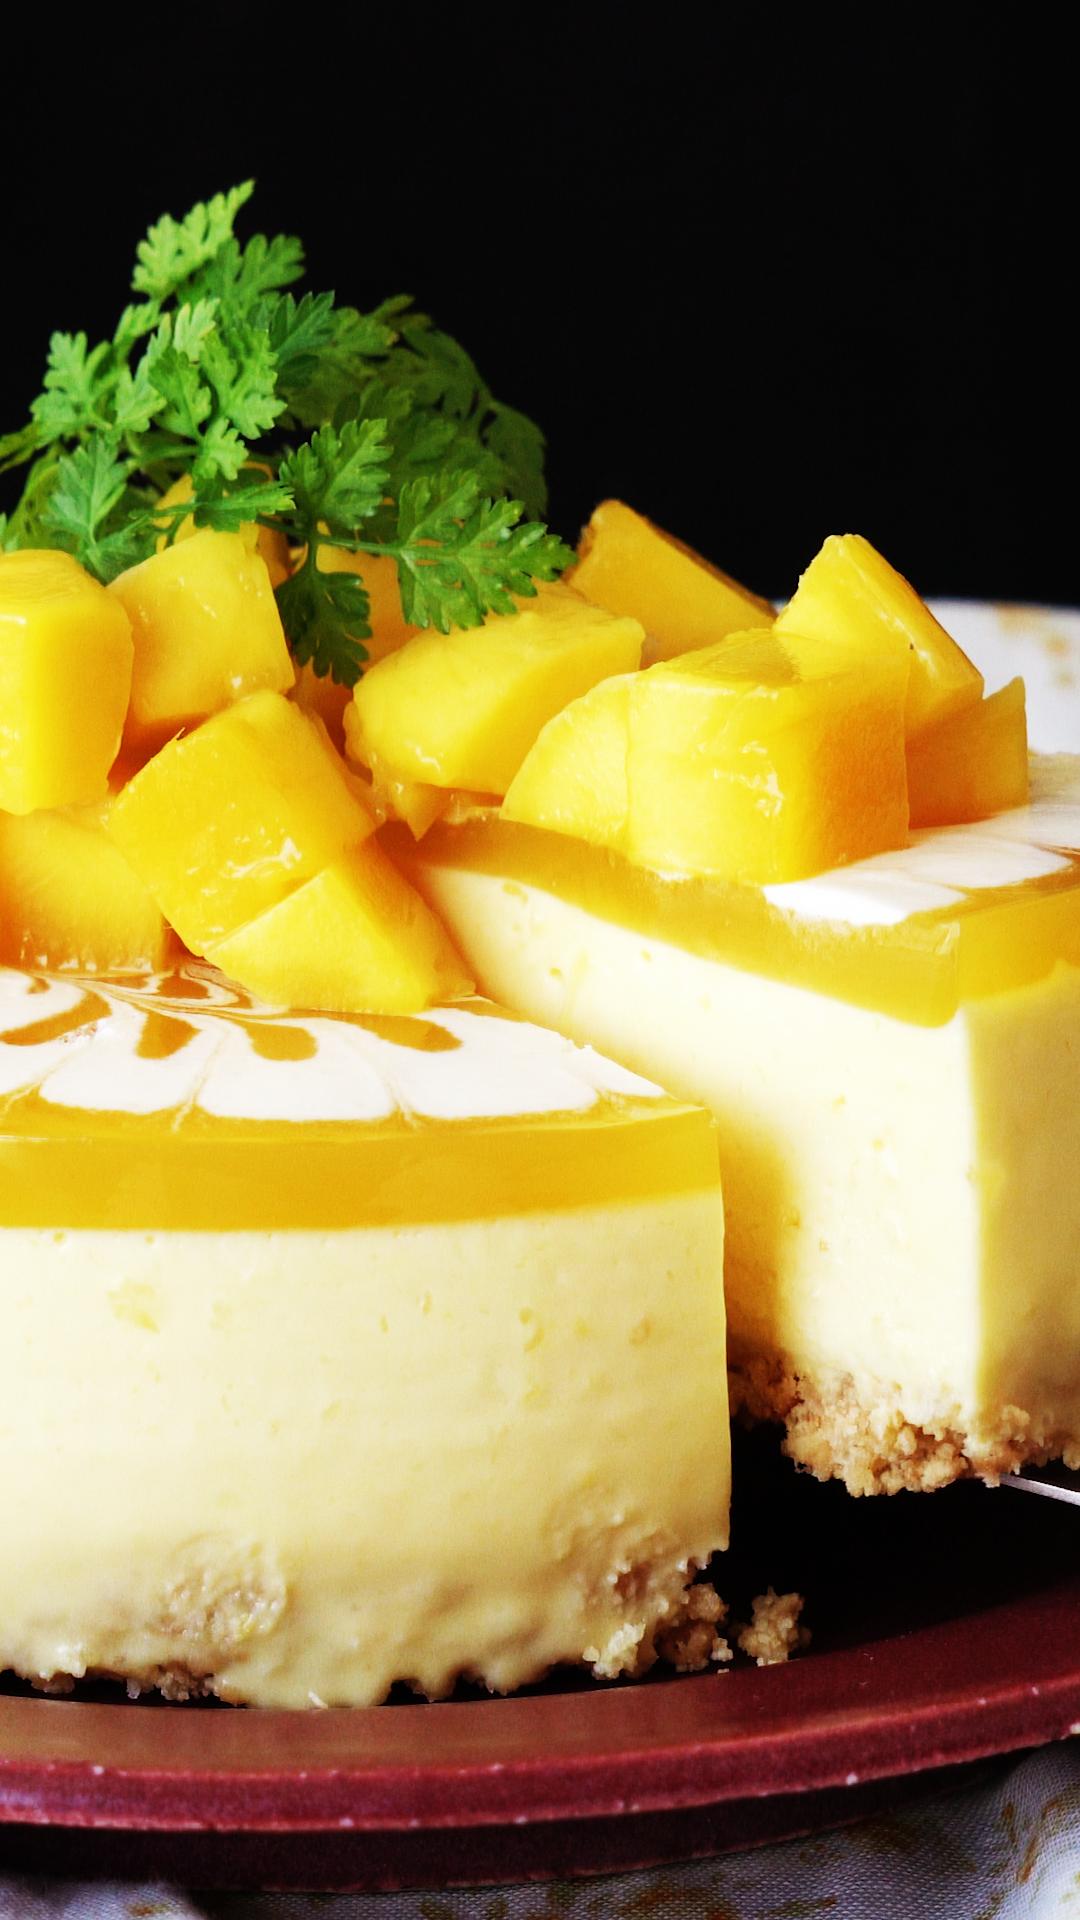 No Bake Mango Cheesecake Recipe In 2020 Mango Dessert Recipes Mango Dessert Yummy Food Dessert